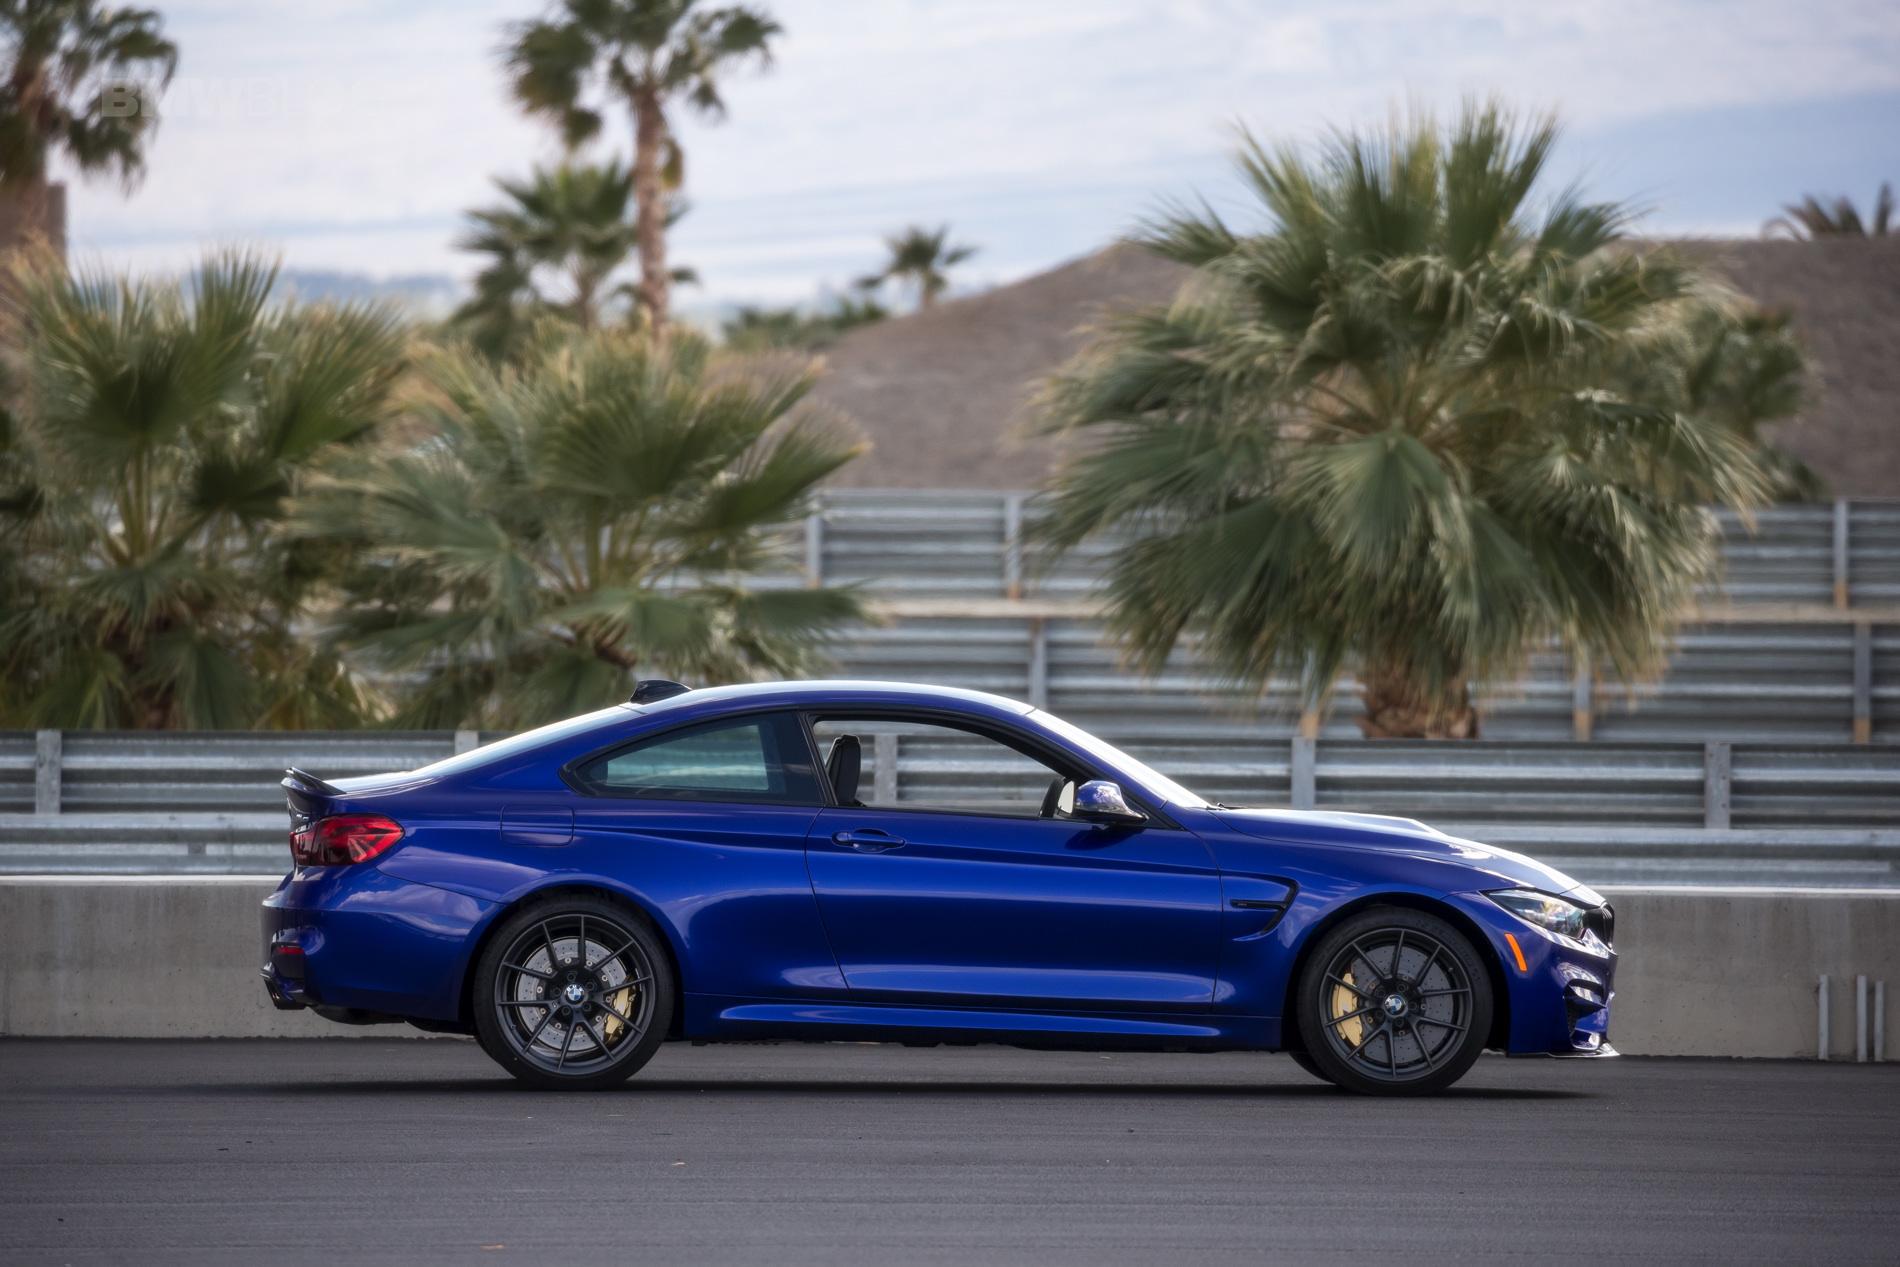 2018 BMW M4 CS Photo Gallery 12